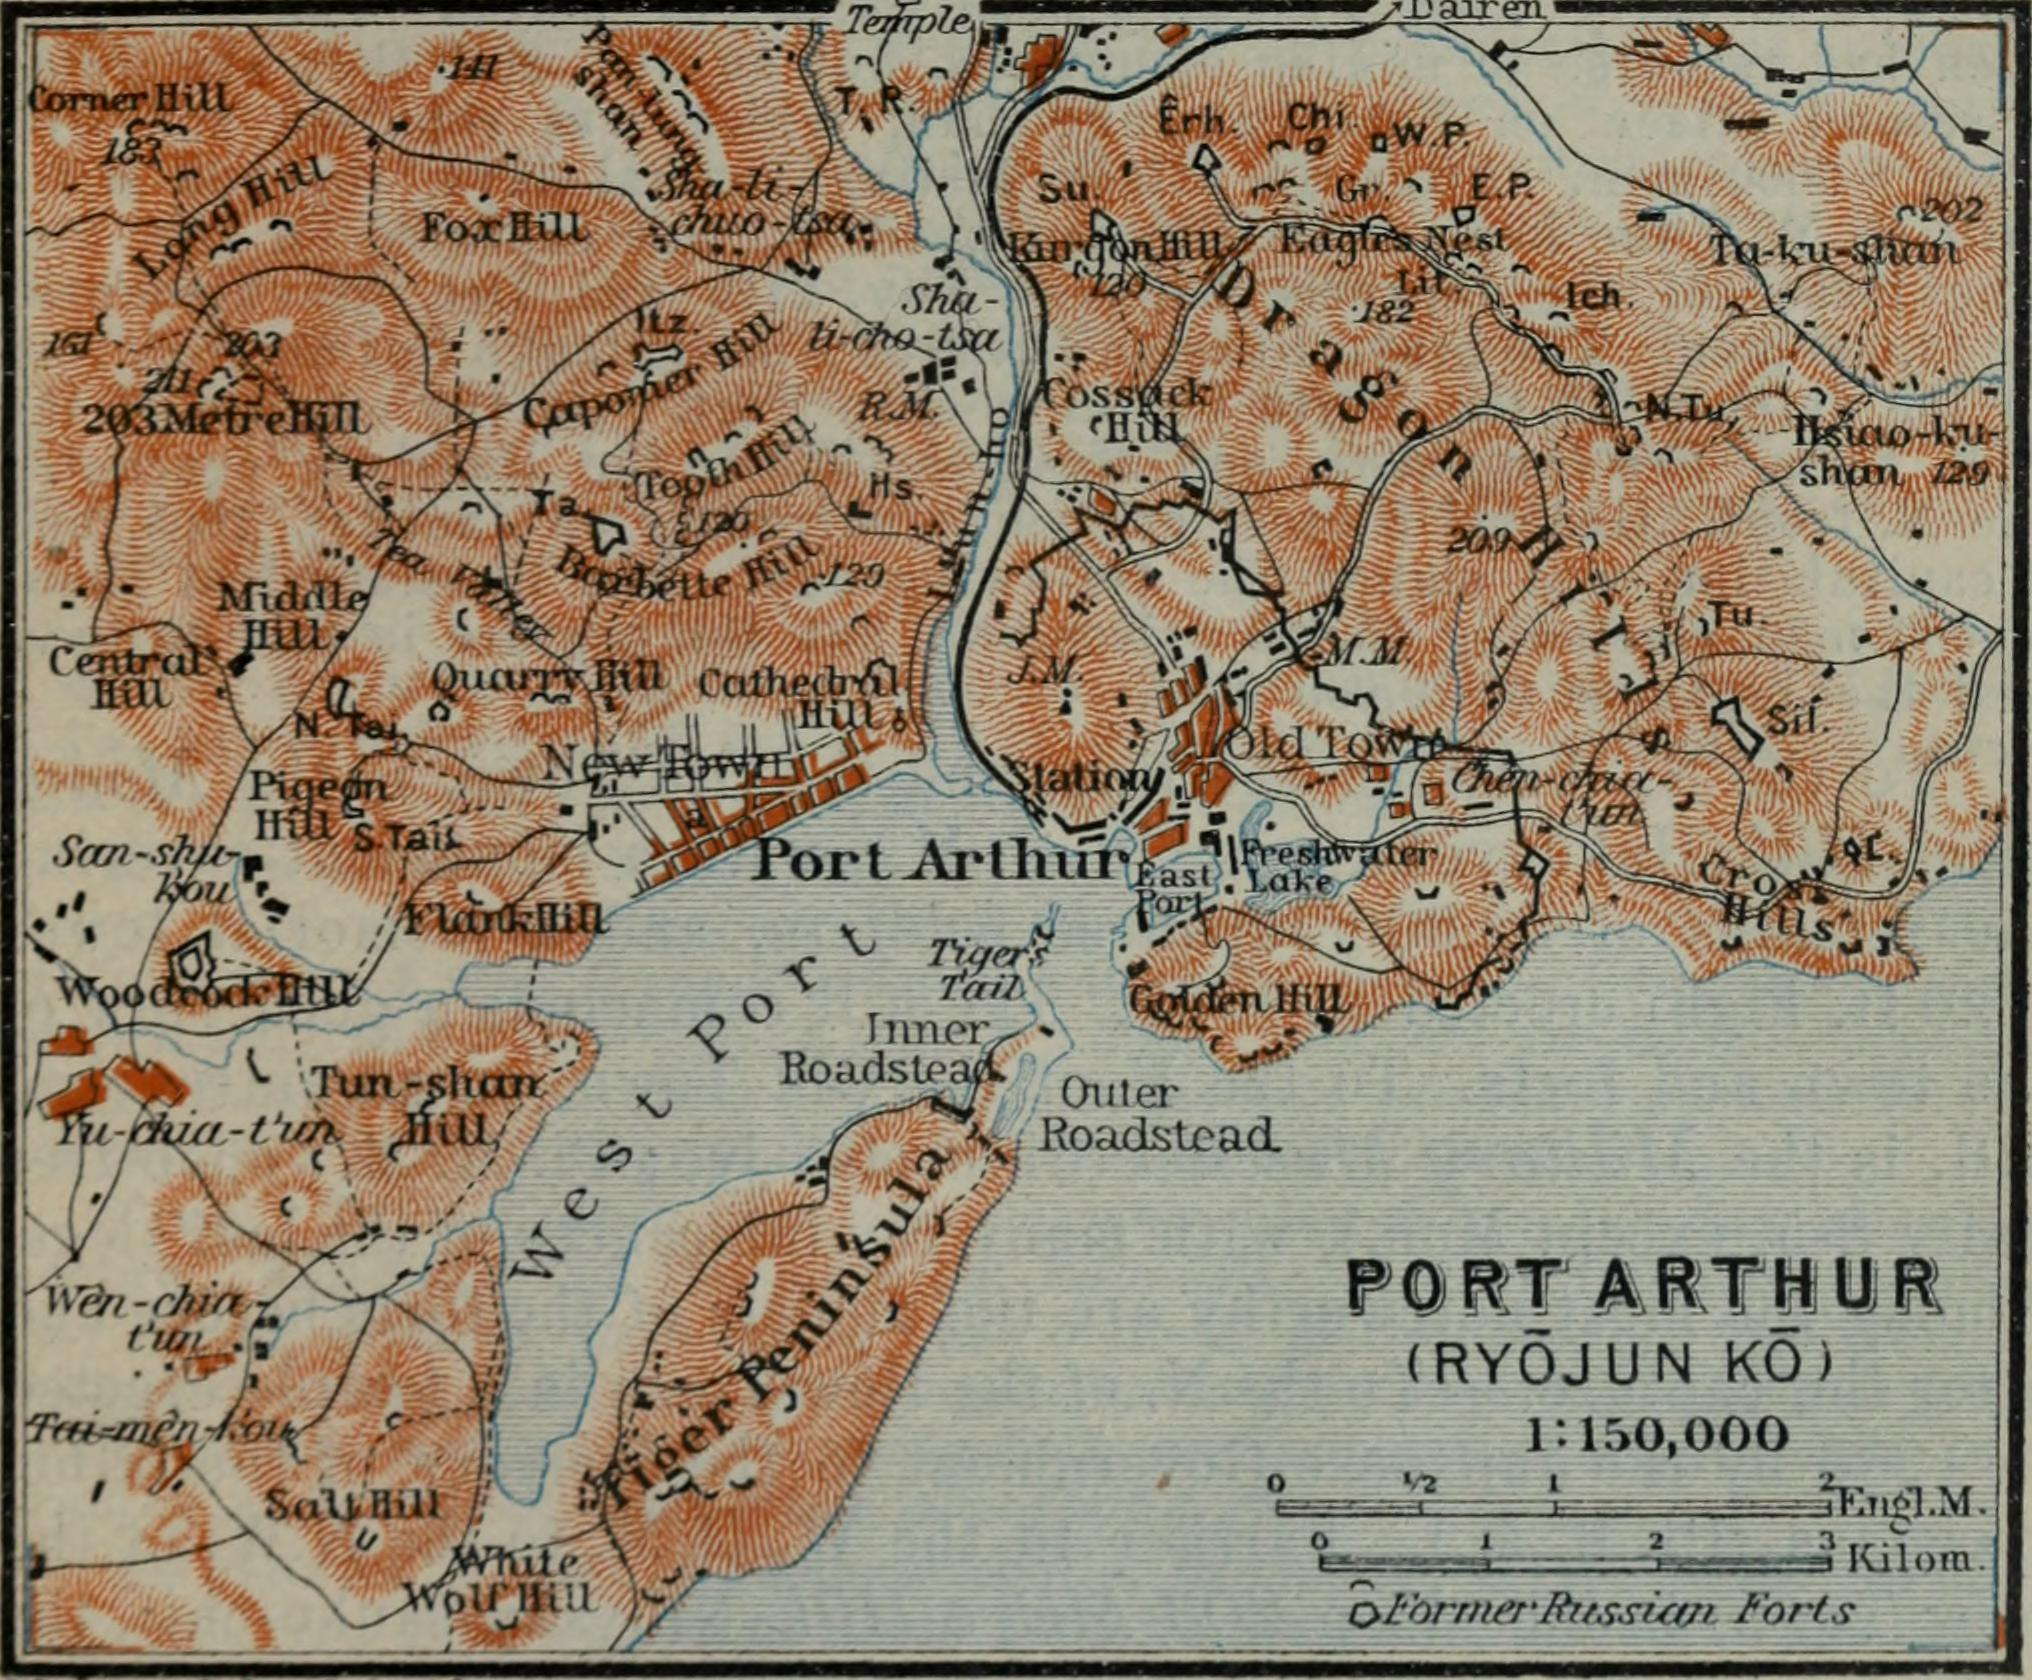 File Russia with Teheran Port Arthur and Peking handbook for